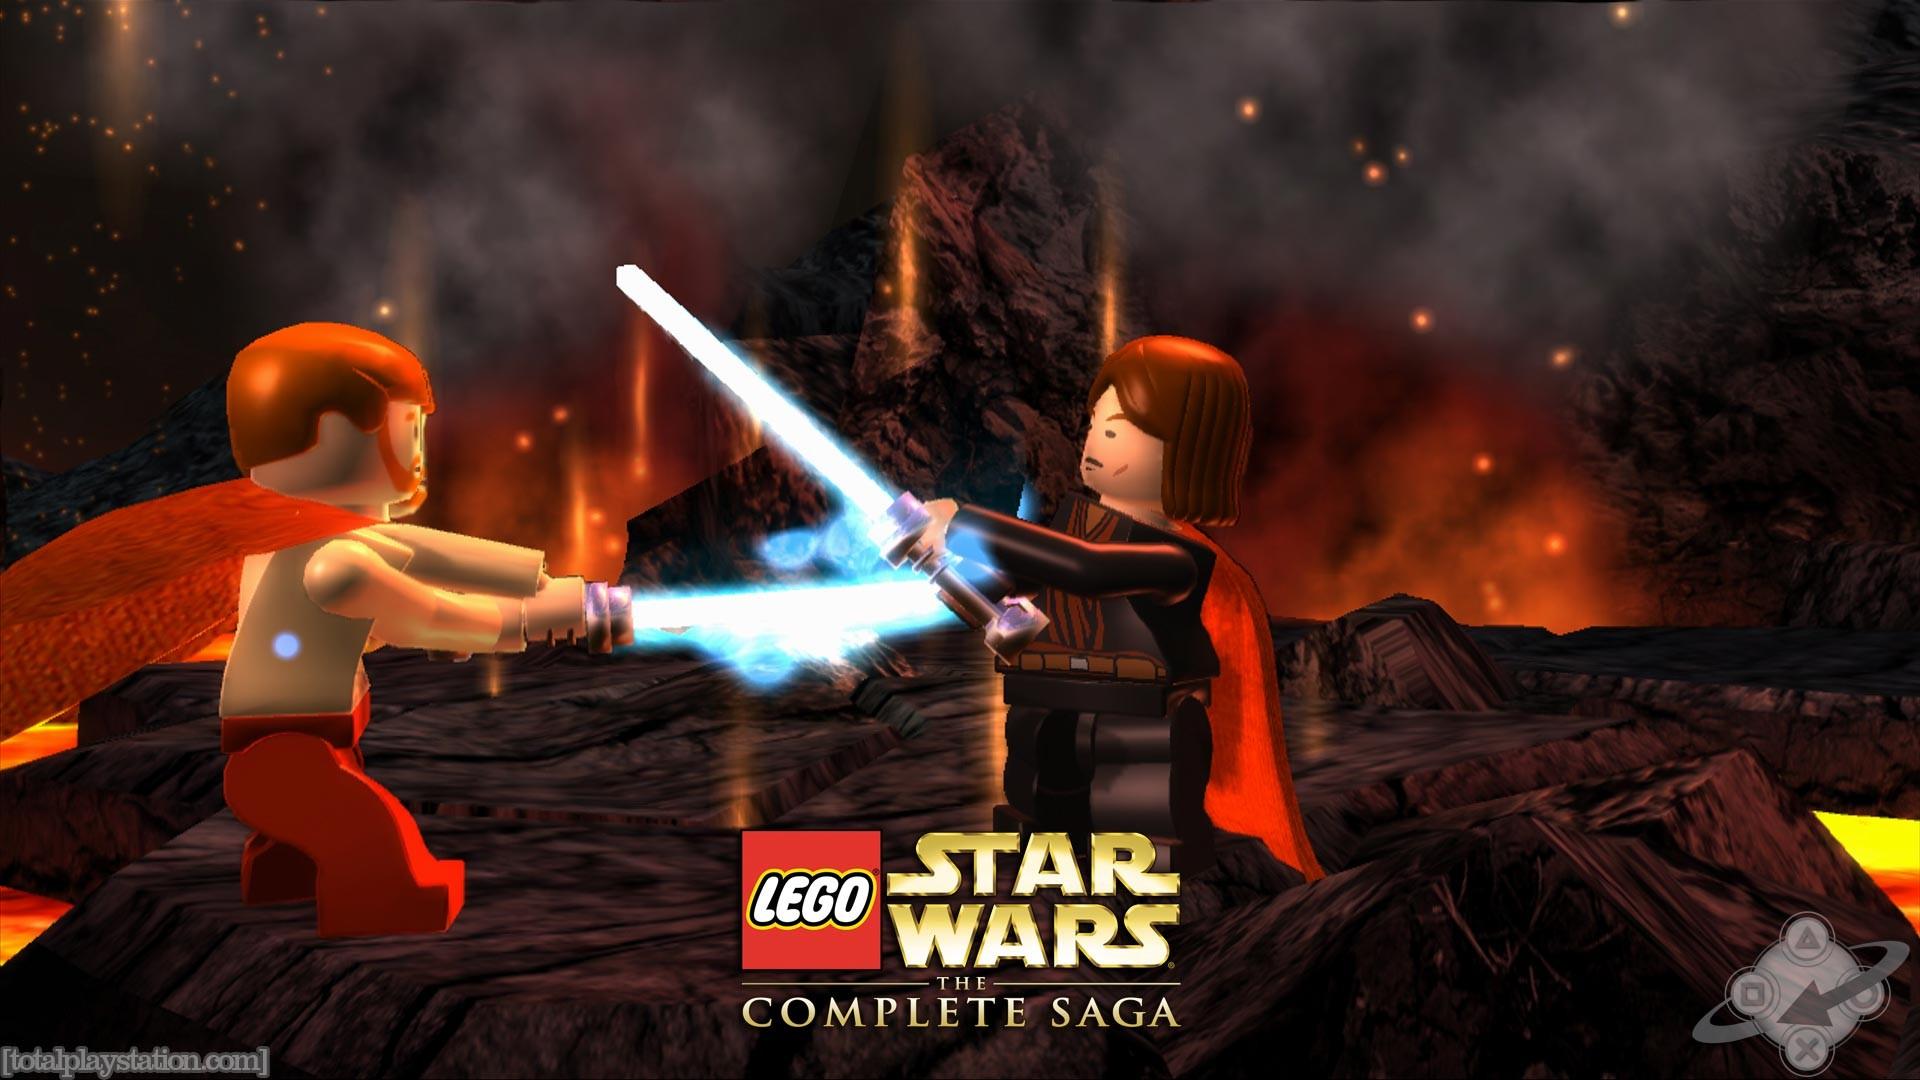 Wallpaper Star Wars Video Games Lego Star Wars Screenshot Pc Game 1920x1080 Gayforgod 235865 Hd Wallpapers Wallhere